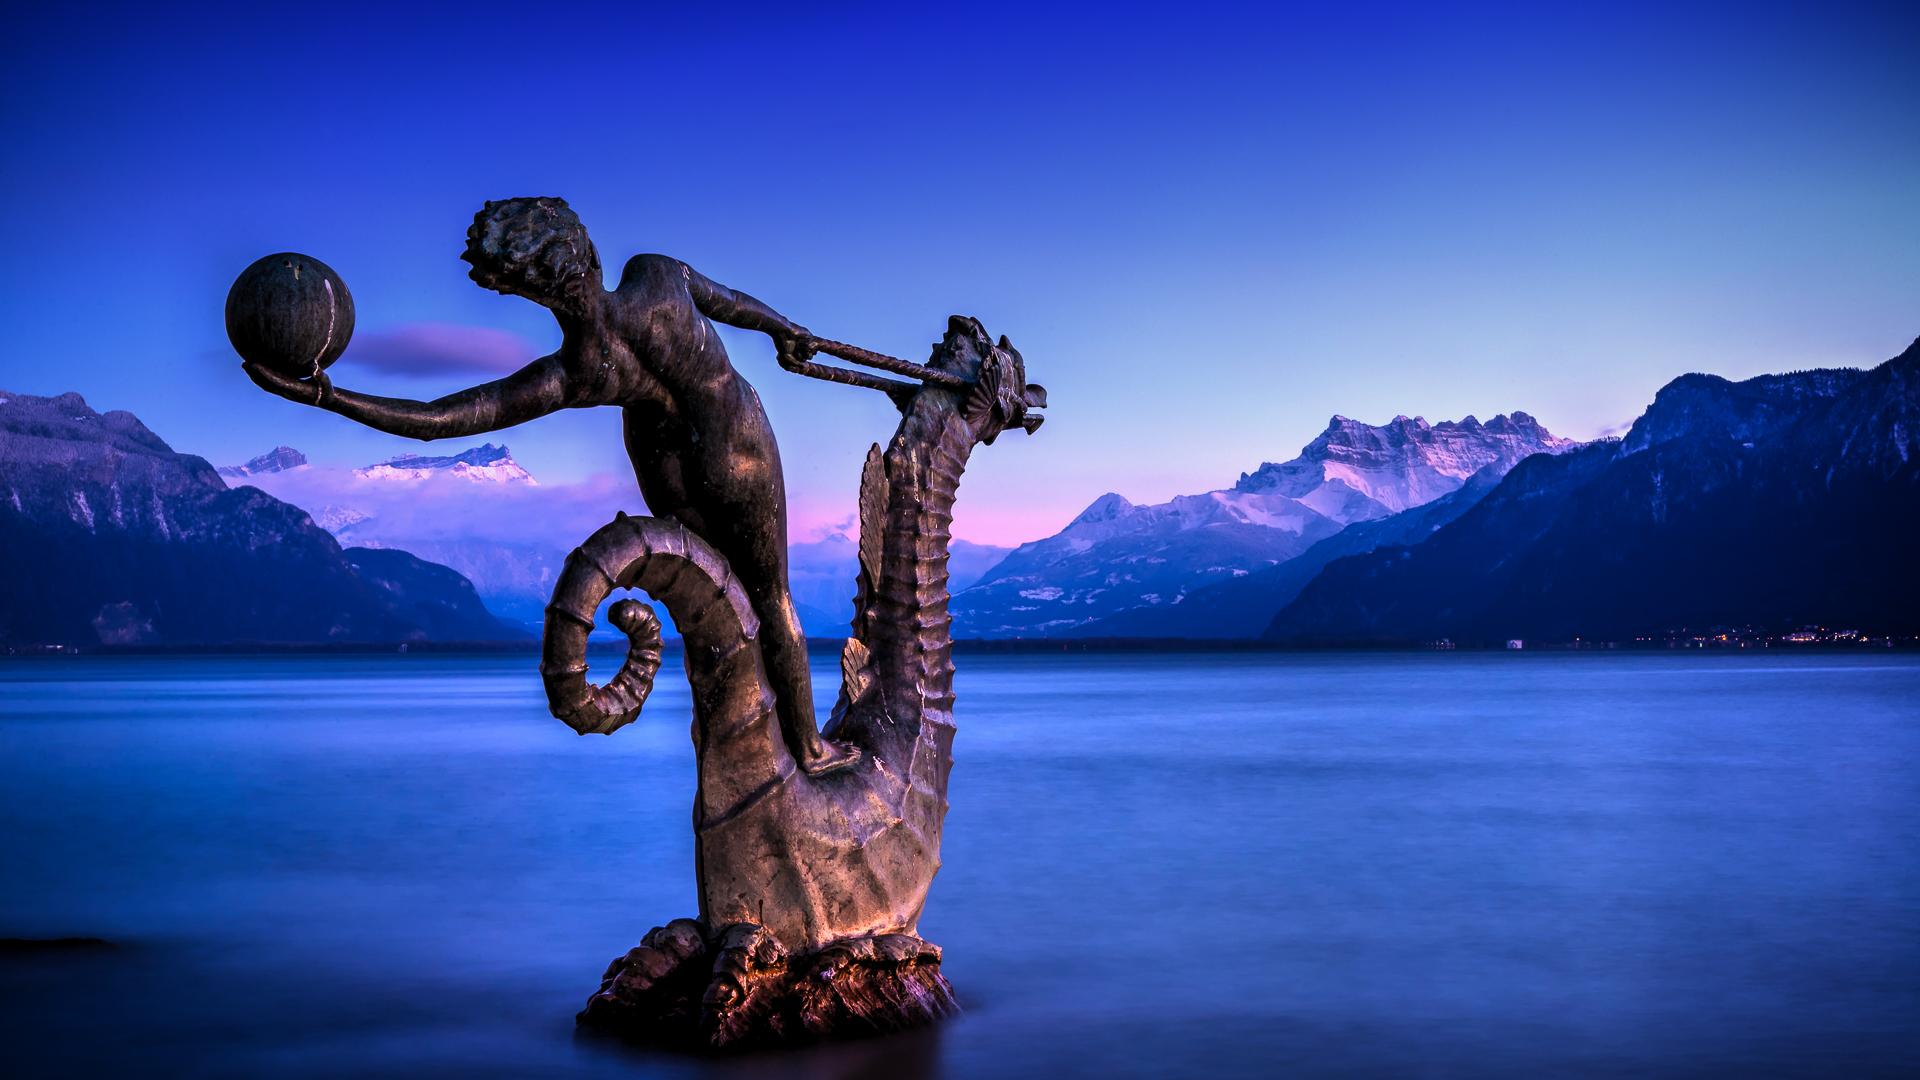 Sea nymph riding seahorse, Switzerland